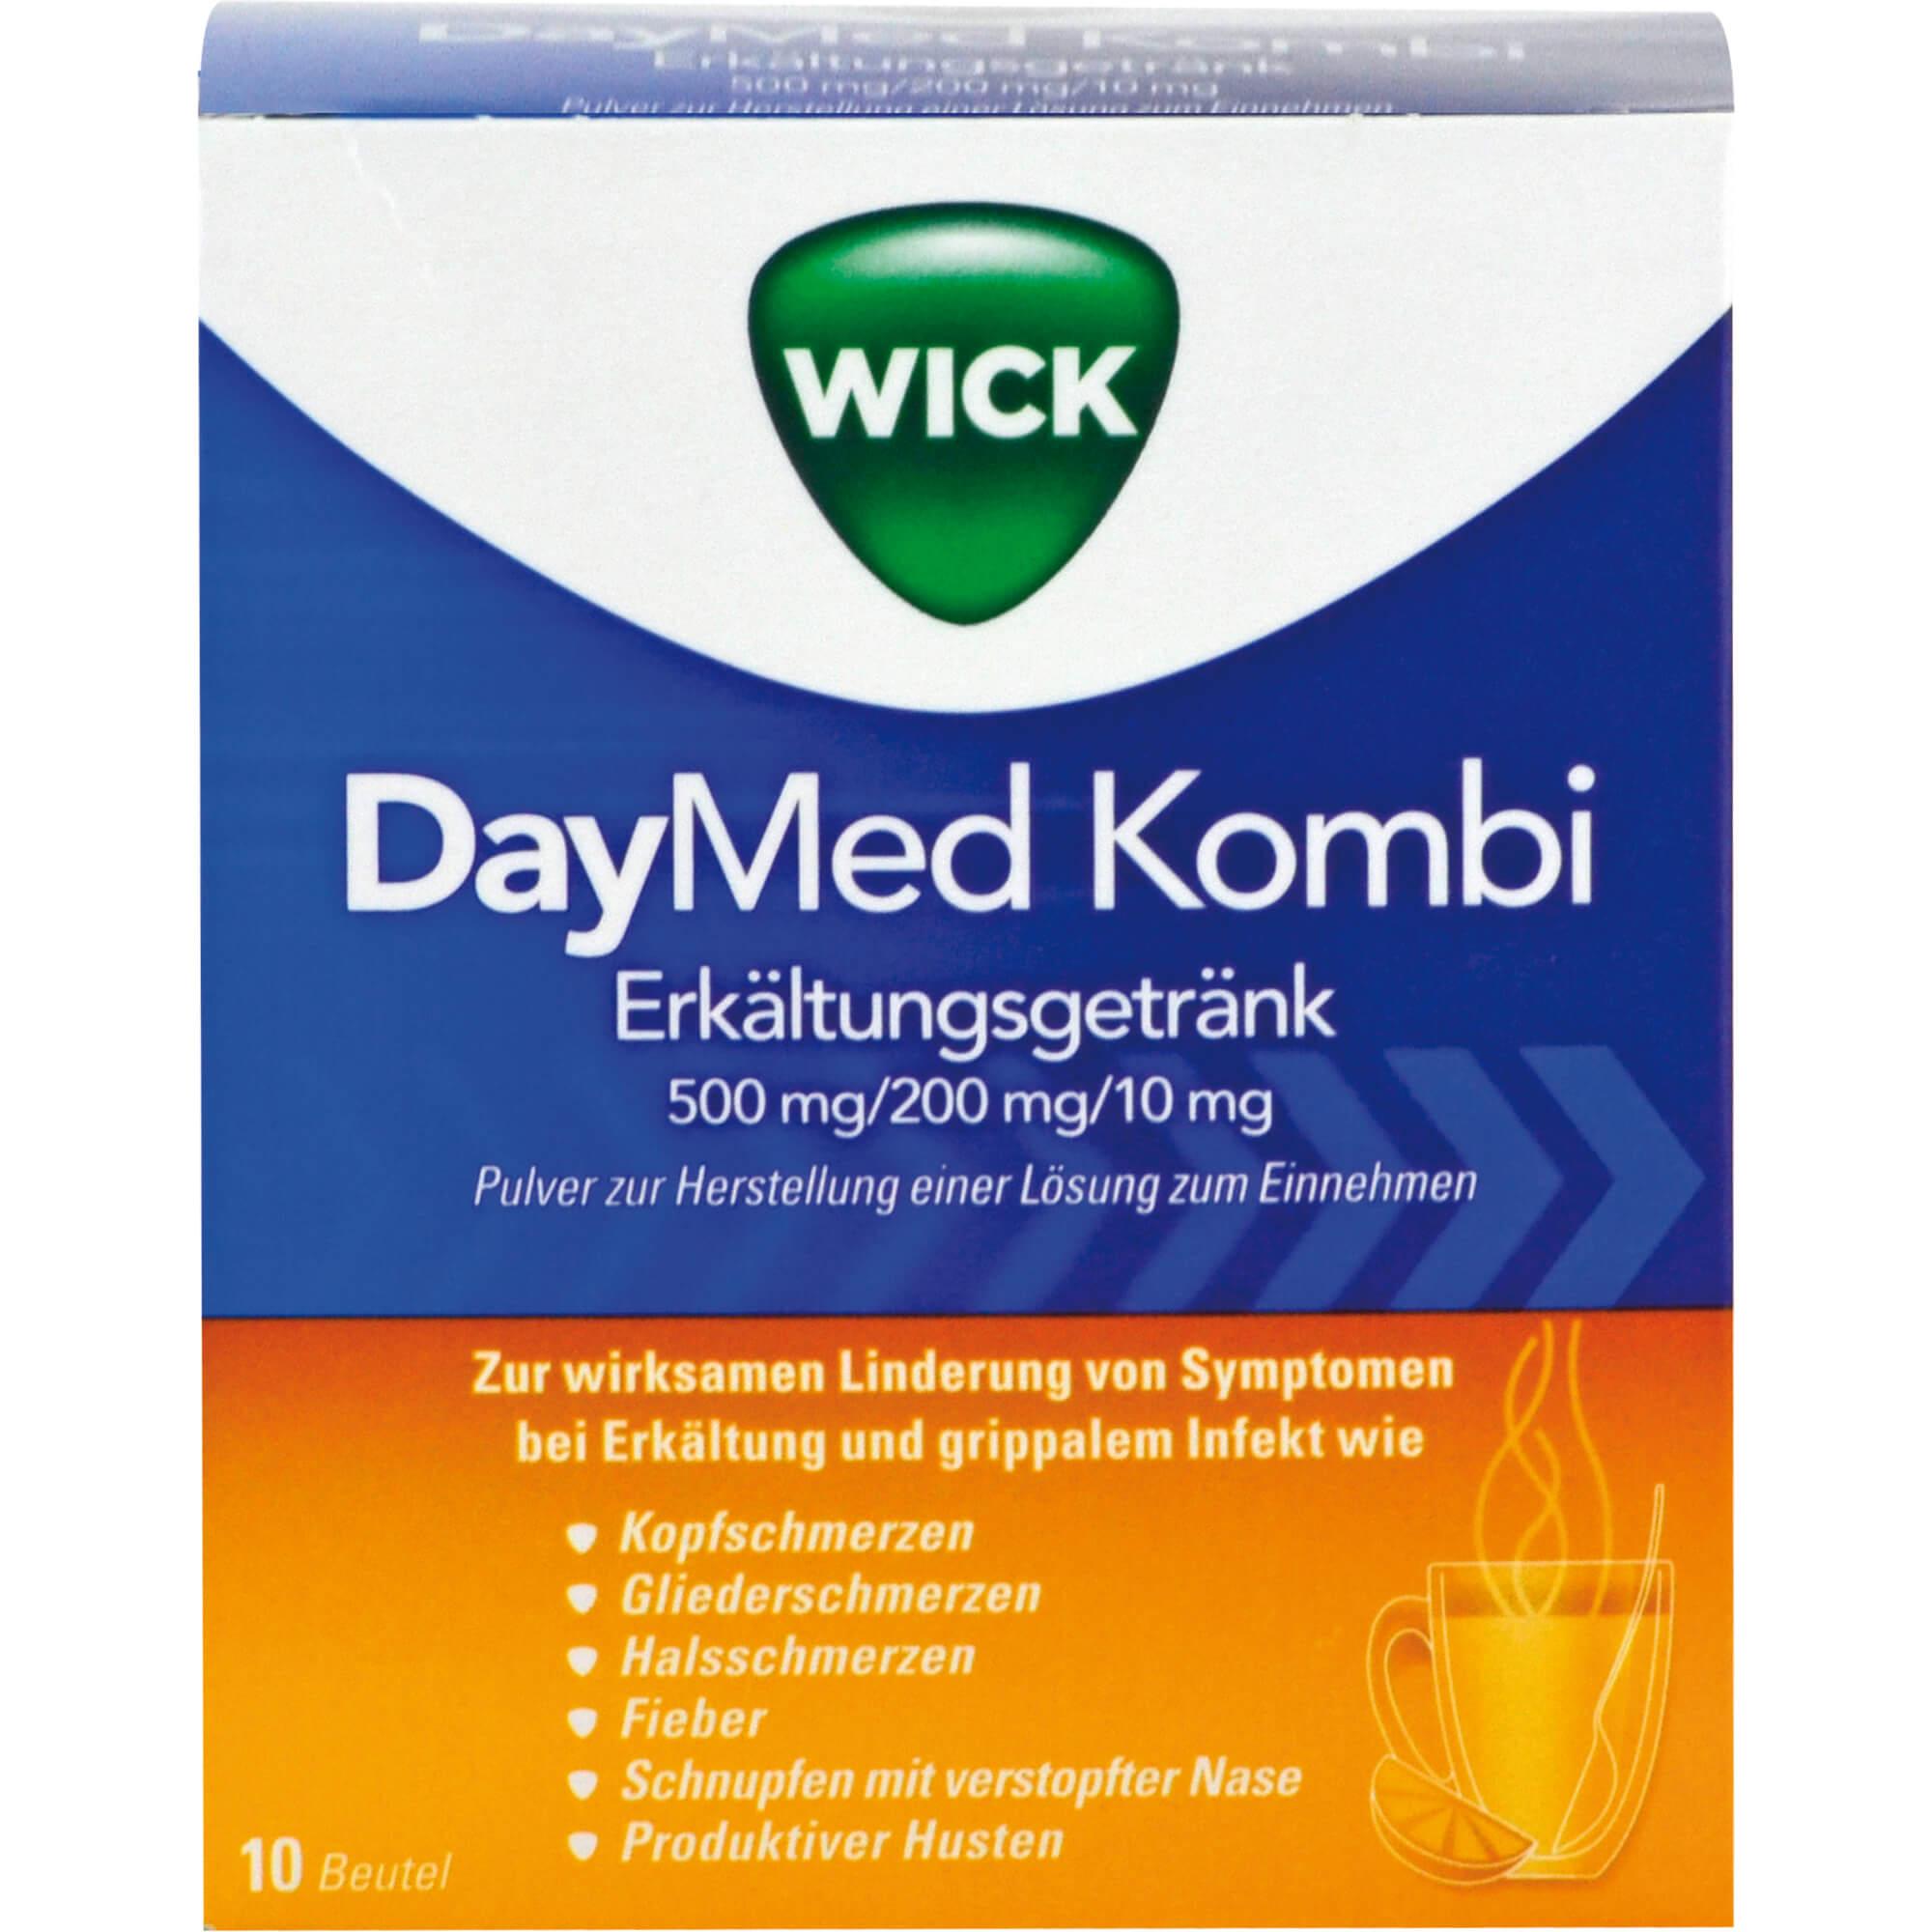 WICK-DayMed-Kombi-Erkaeltungsgetraenk